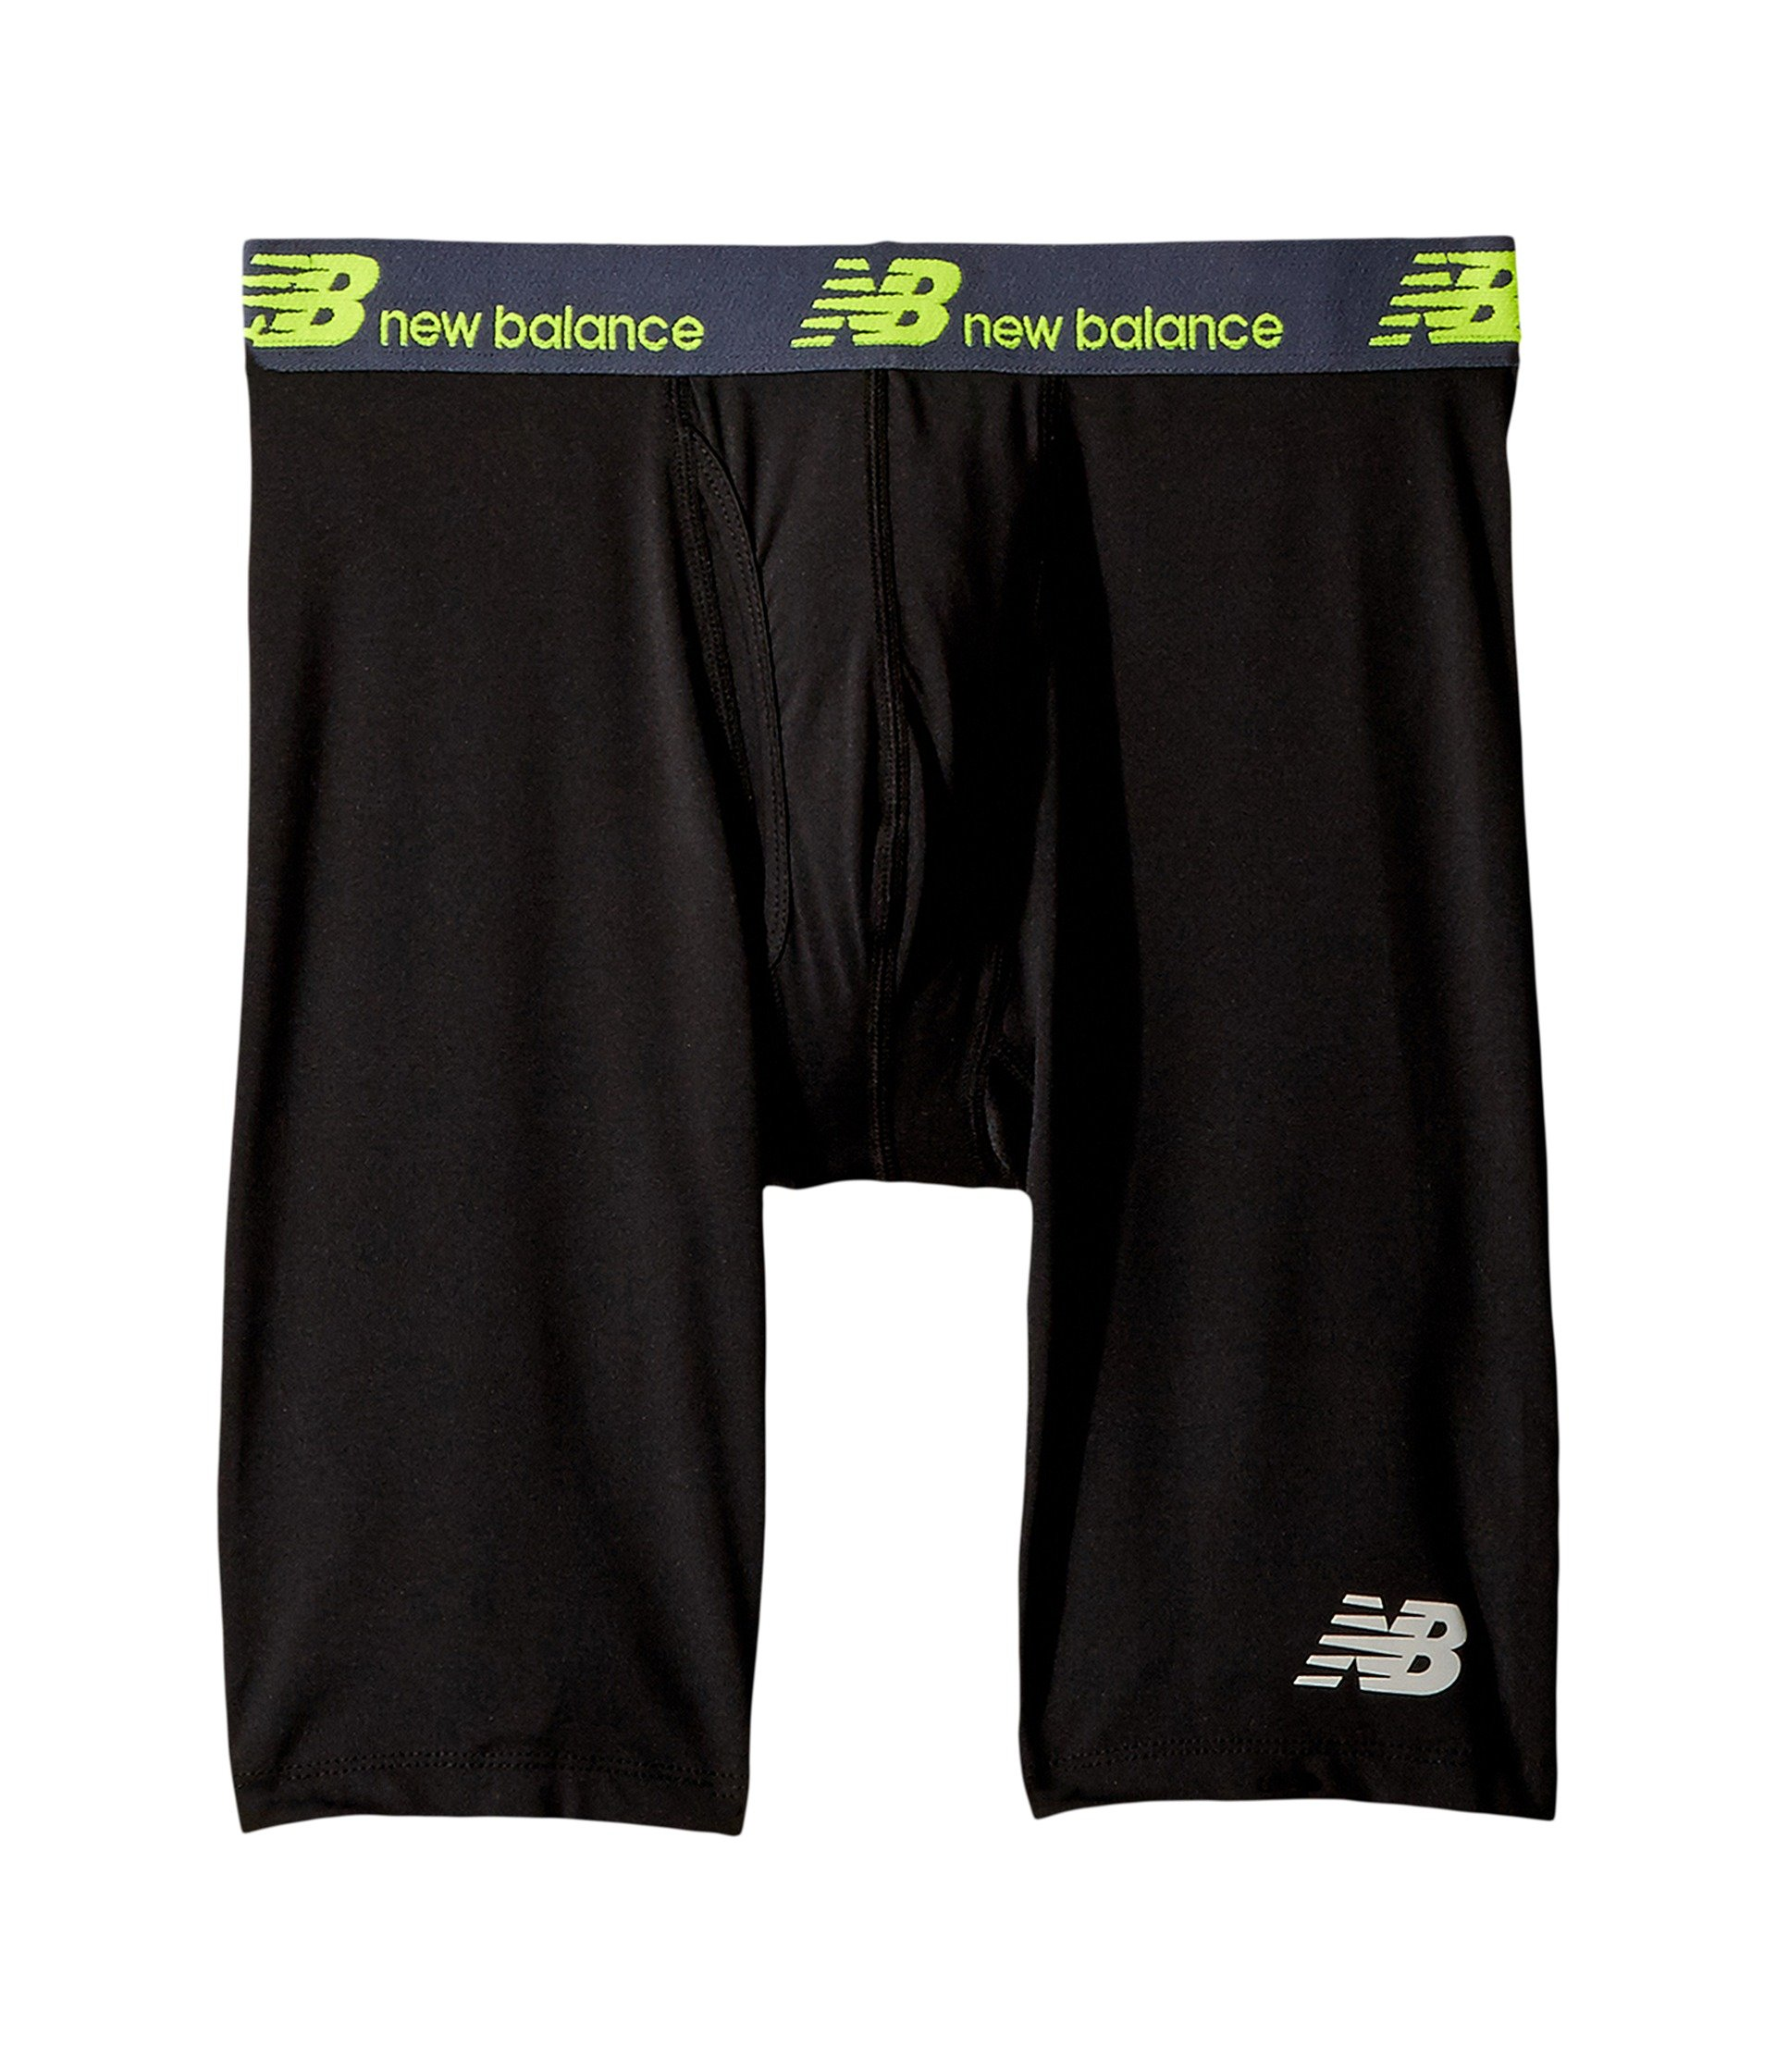 Ropa Interior para Hombre New Balance 9and#34; Boxer Brief 1-Pack  + New Balance en VeoyCompro.net